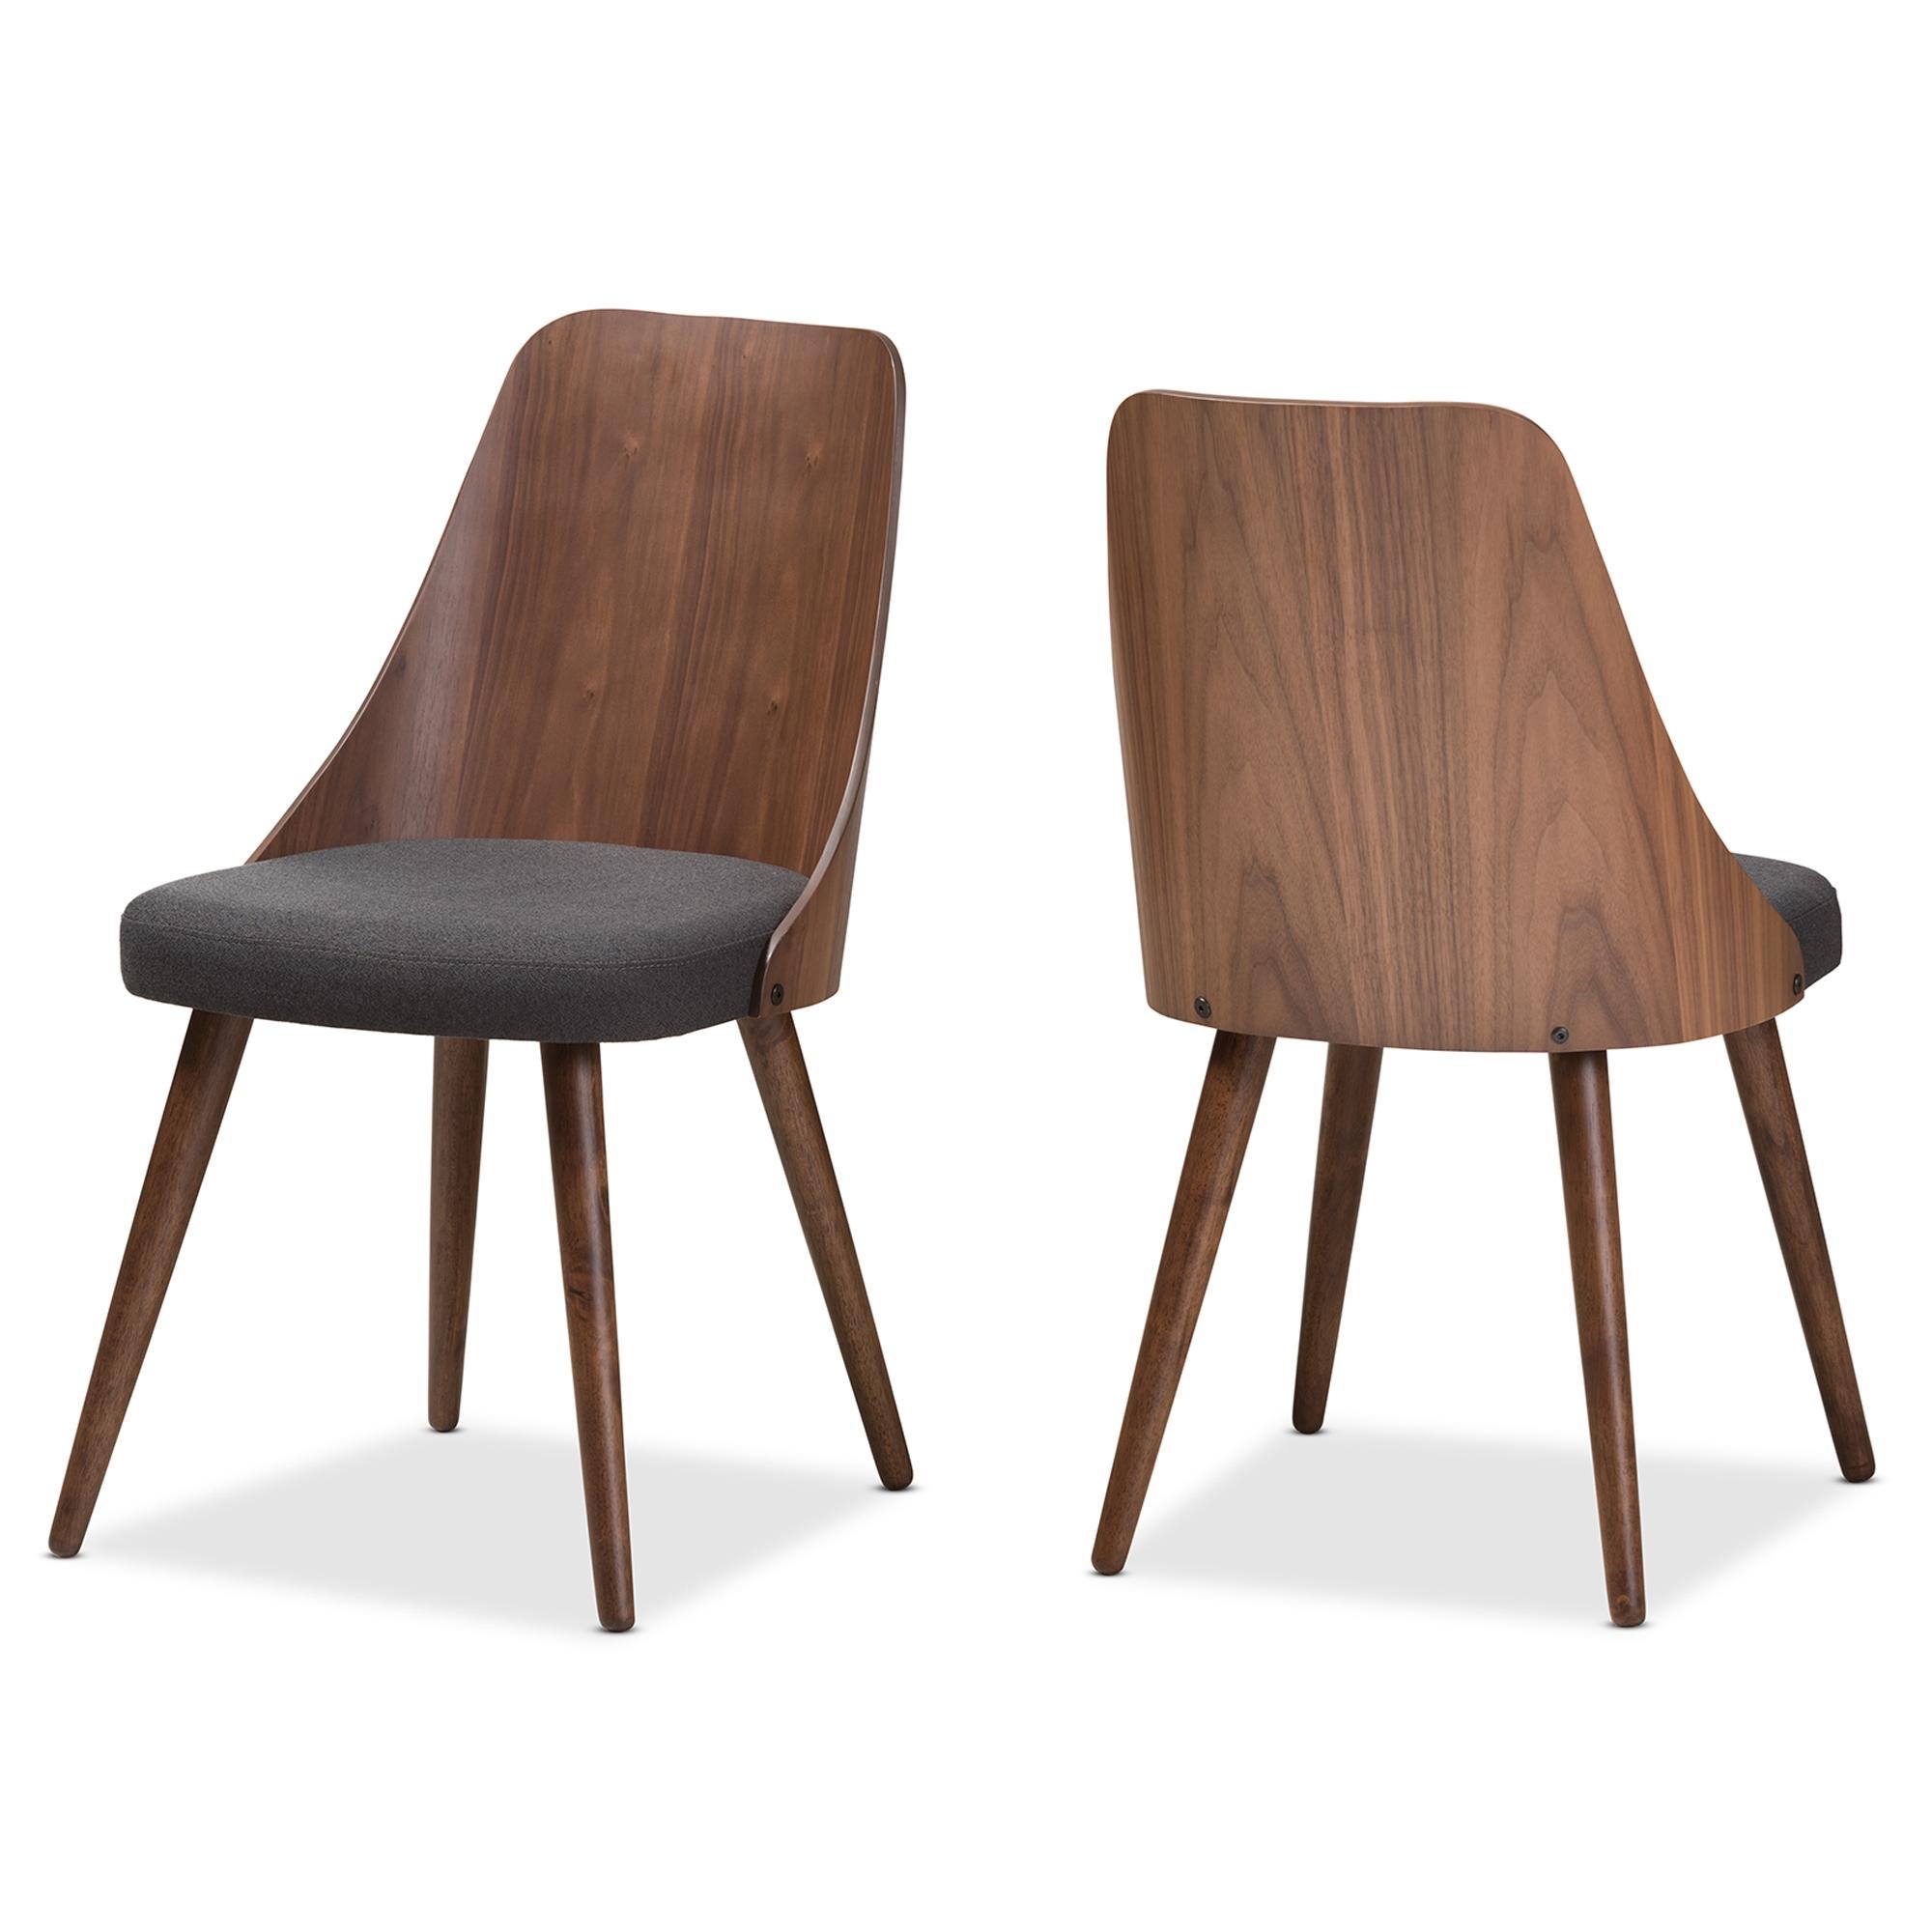 dark walnut dining chairs top rated massage baxton studio romily mid century modern wood